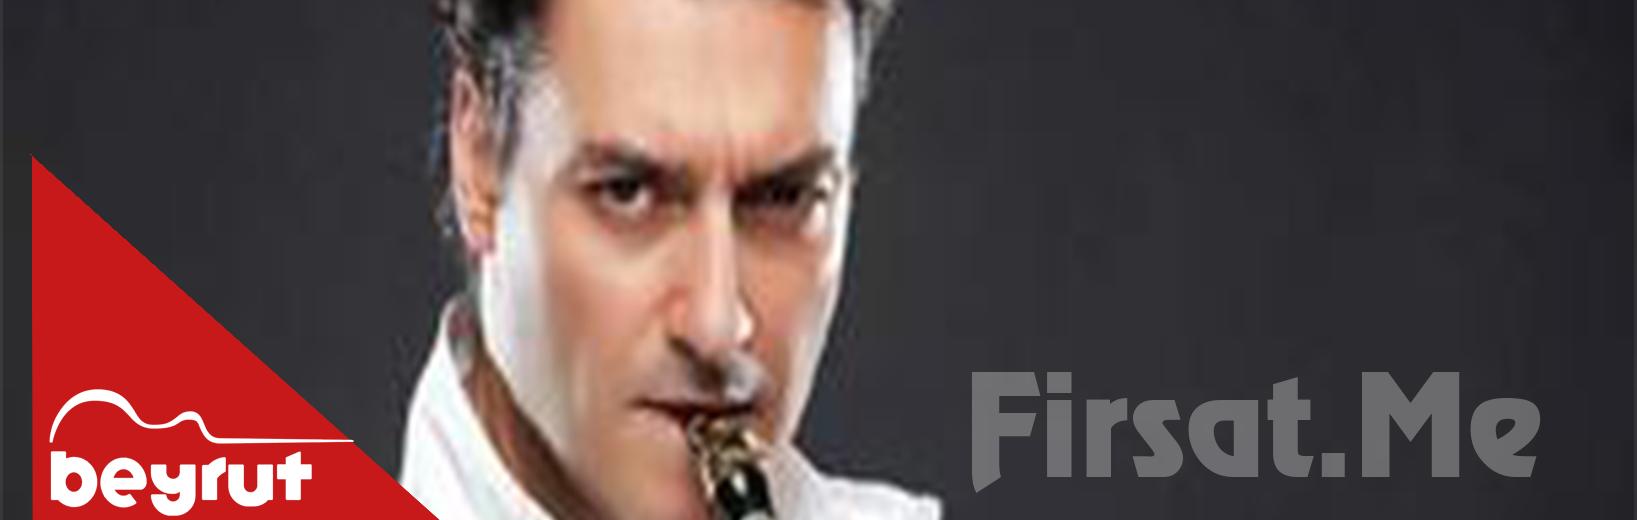 Beyrut Performance Kartal Sahne'de 5 Kasım'da 'Tayfun' Konser Bileti